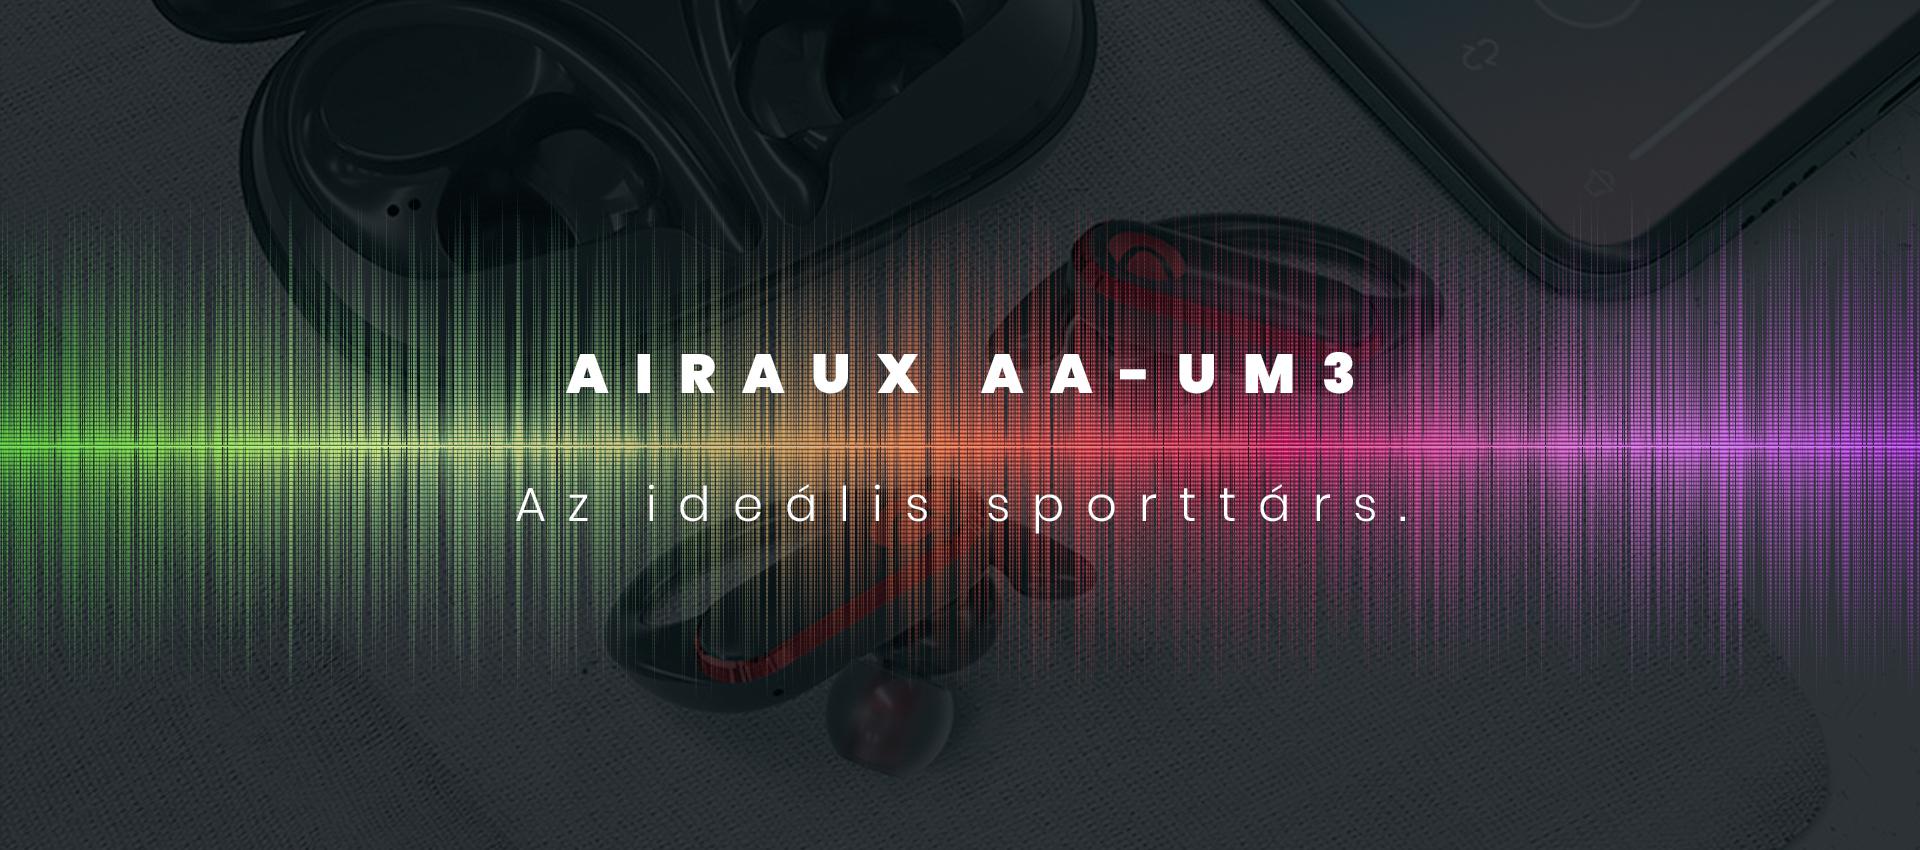 AA-UM3